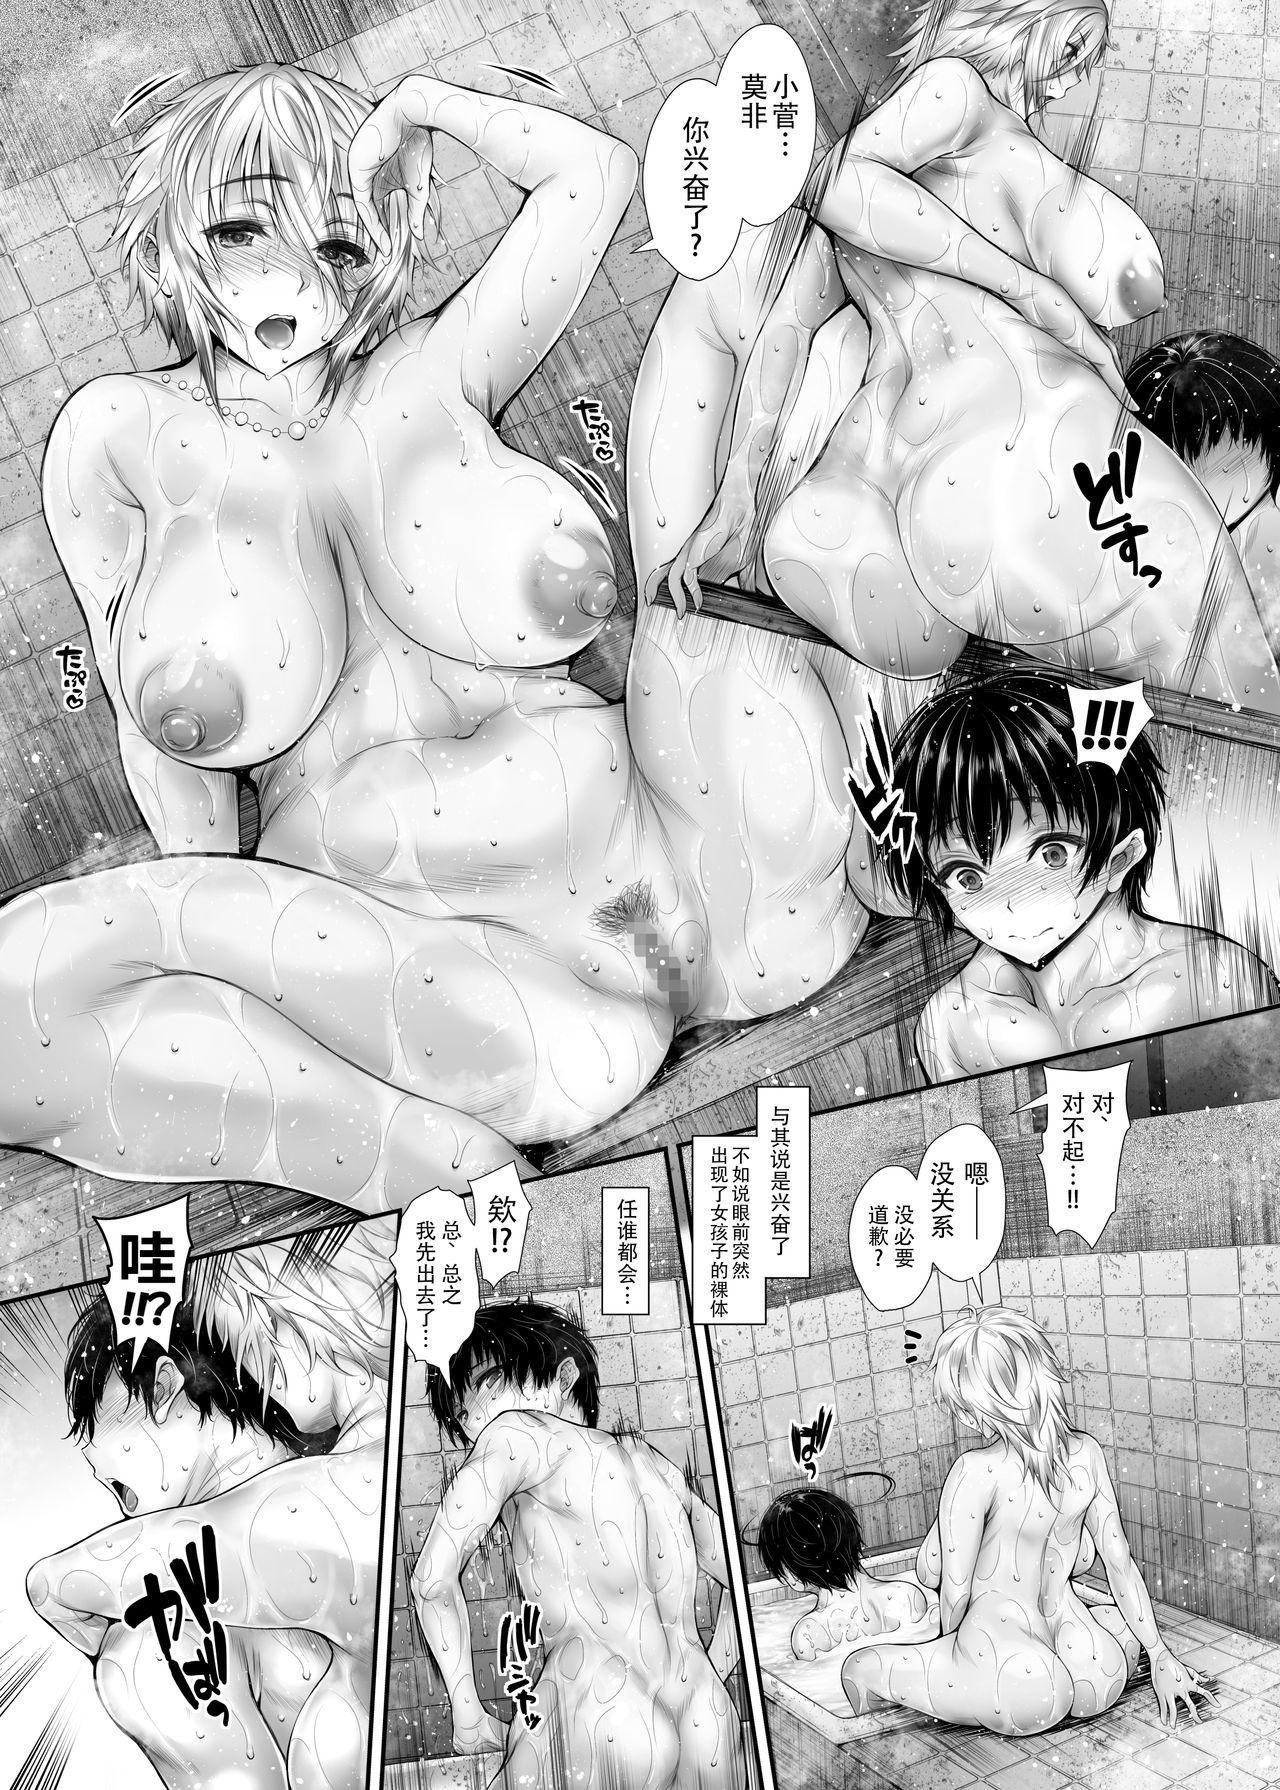 Share House no Seikatsu Rule 3